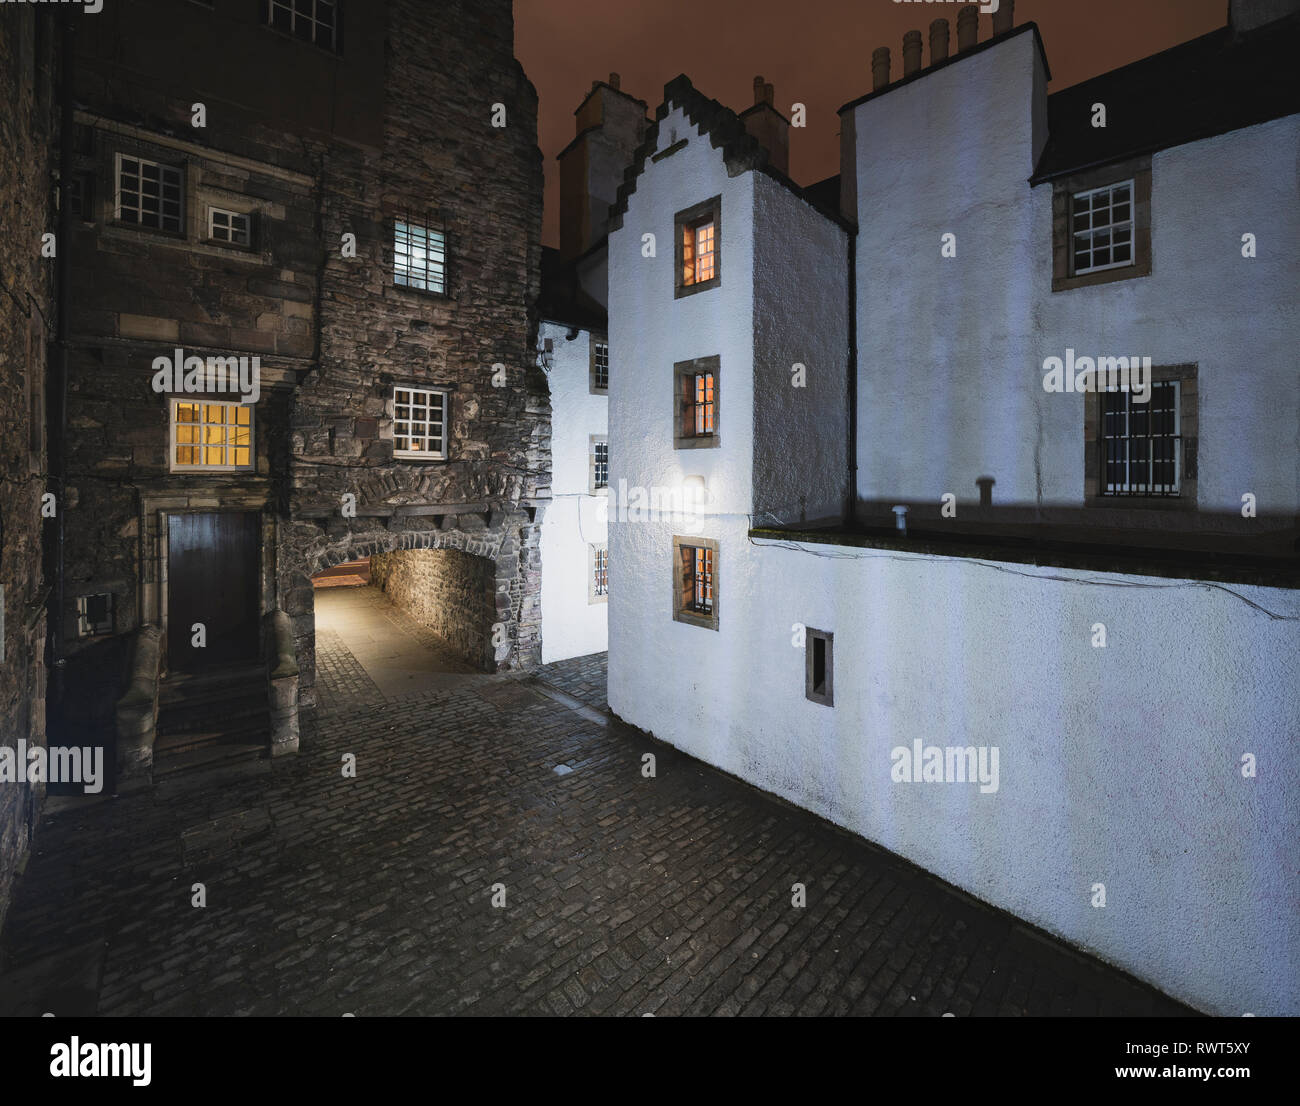 Night view of Bakehouse Close on Royal Mile in Edinburgh, Scotland UK. Location of Outlander as fictional Carfax Close. Scotland ,UK - Stock Image